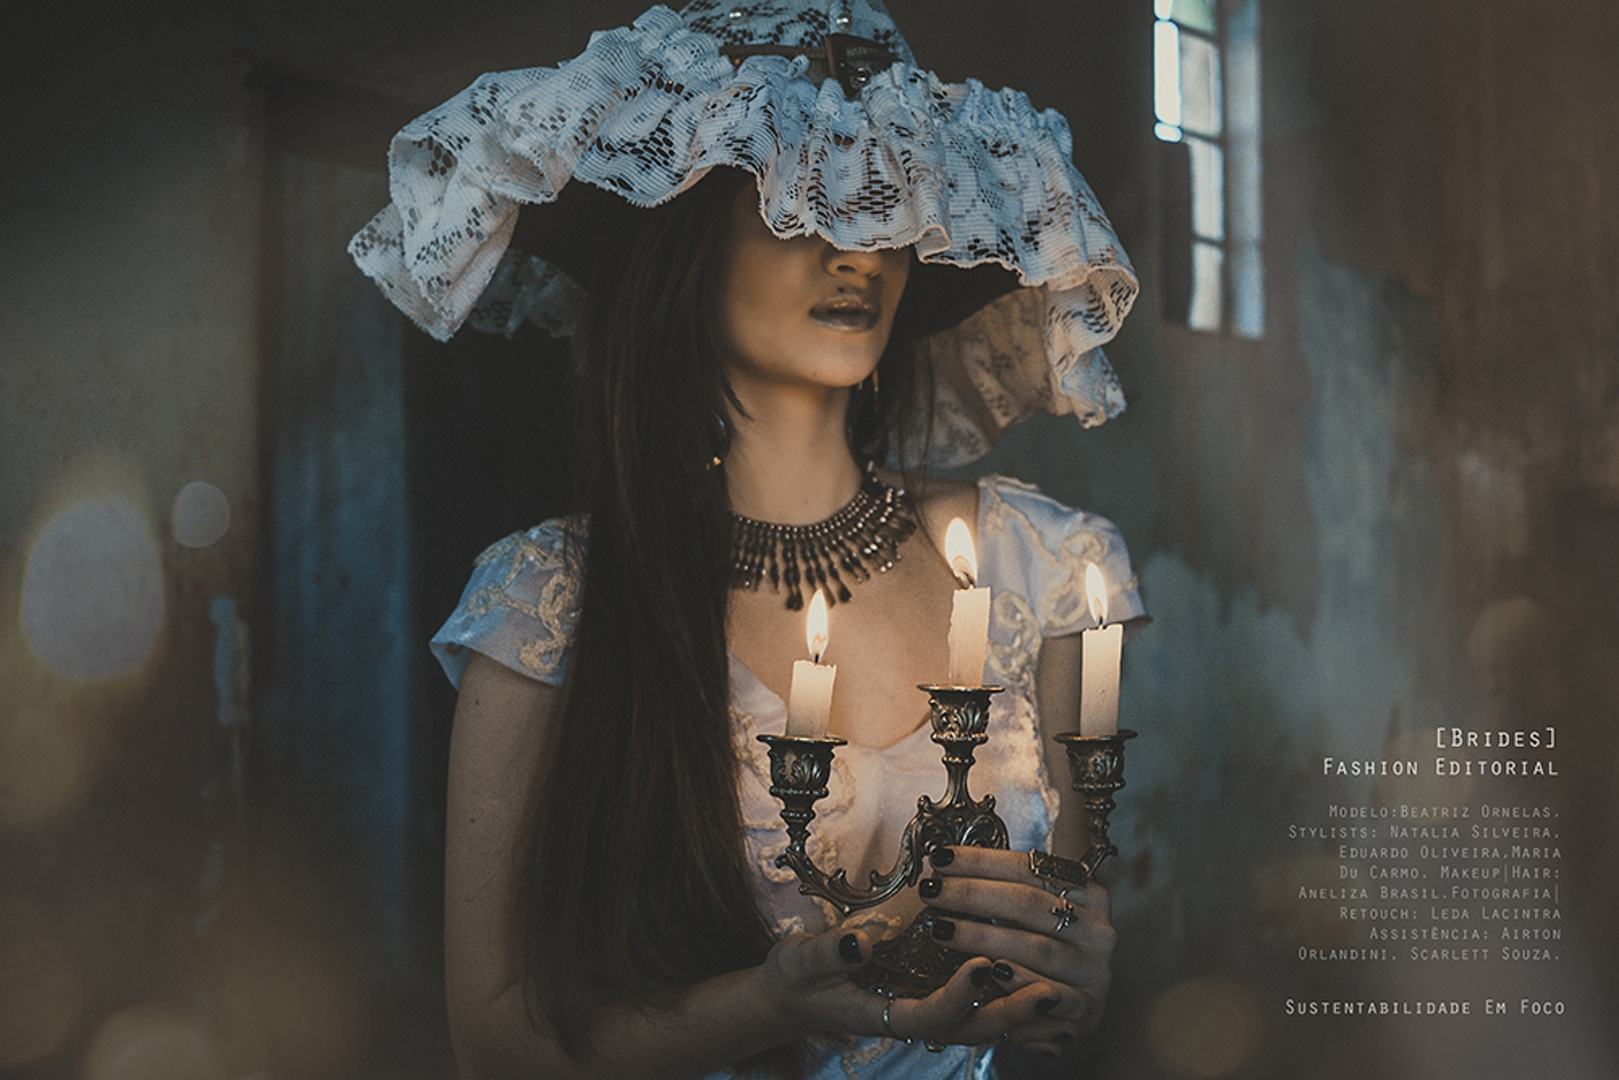 photographer-leda-lacintra model-emilija-budginaite makeup color model skin eyelashes studio bescouted talent wedding dress